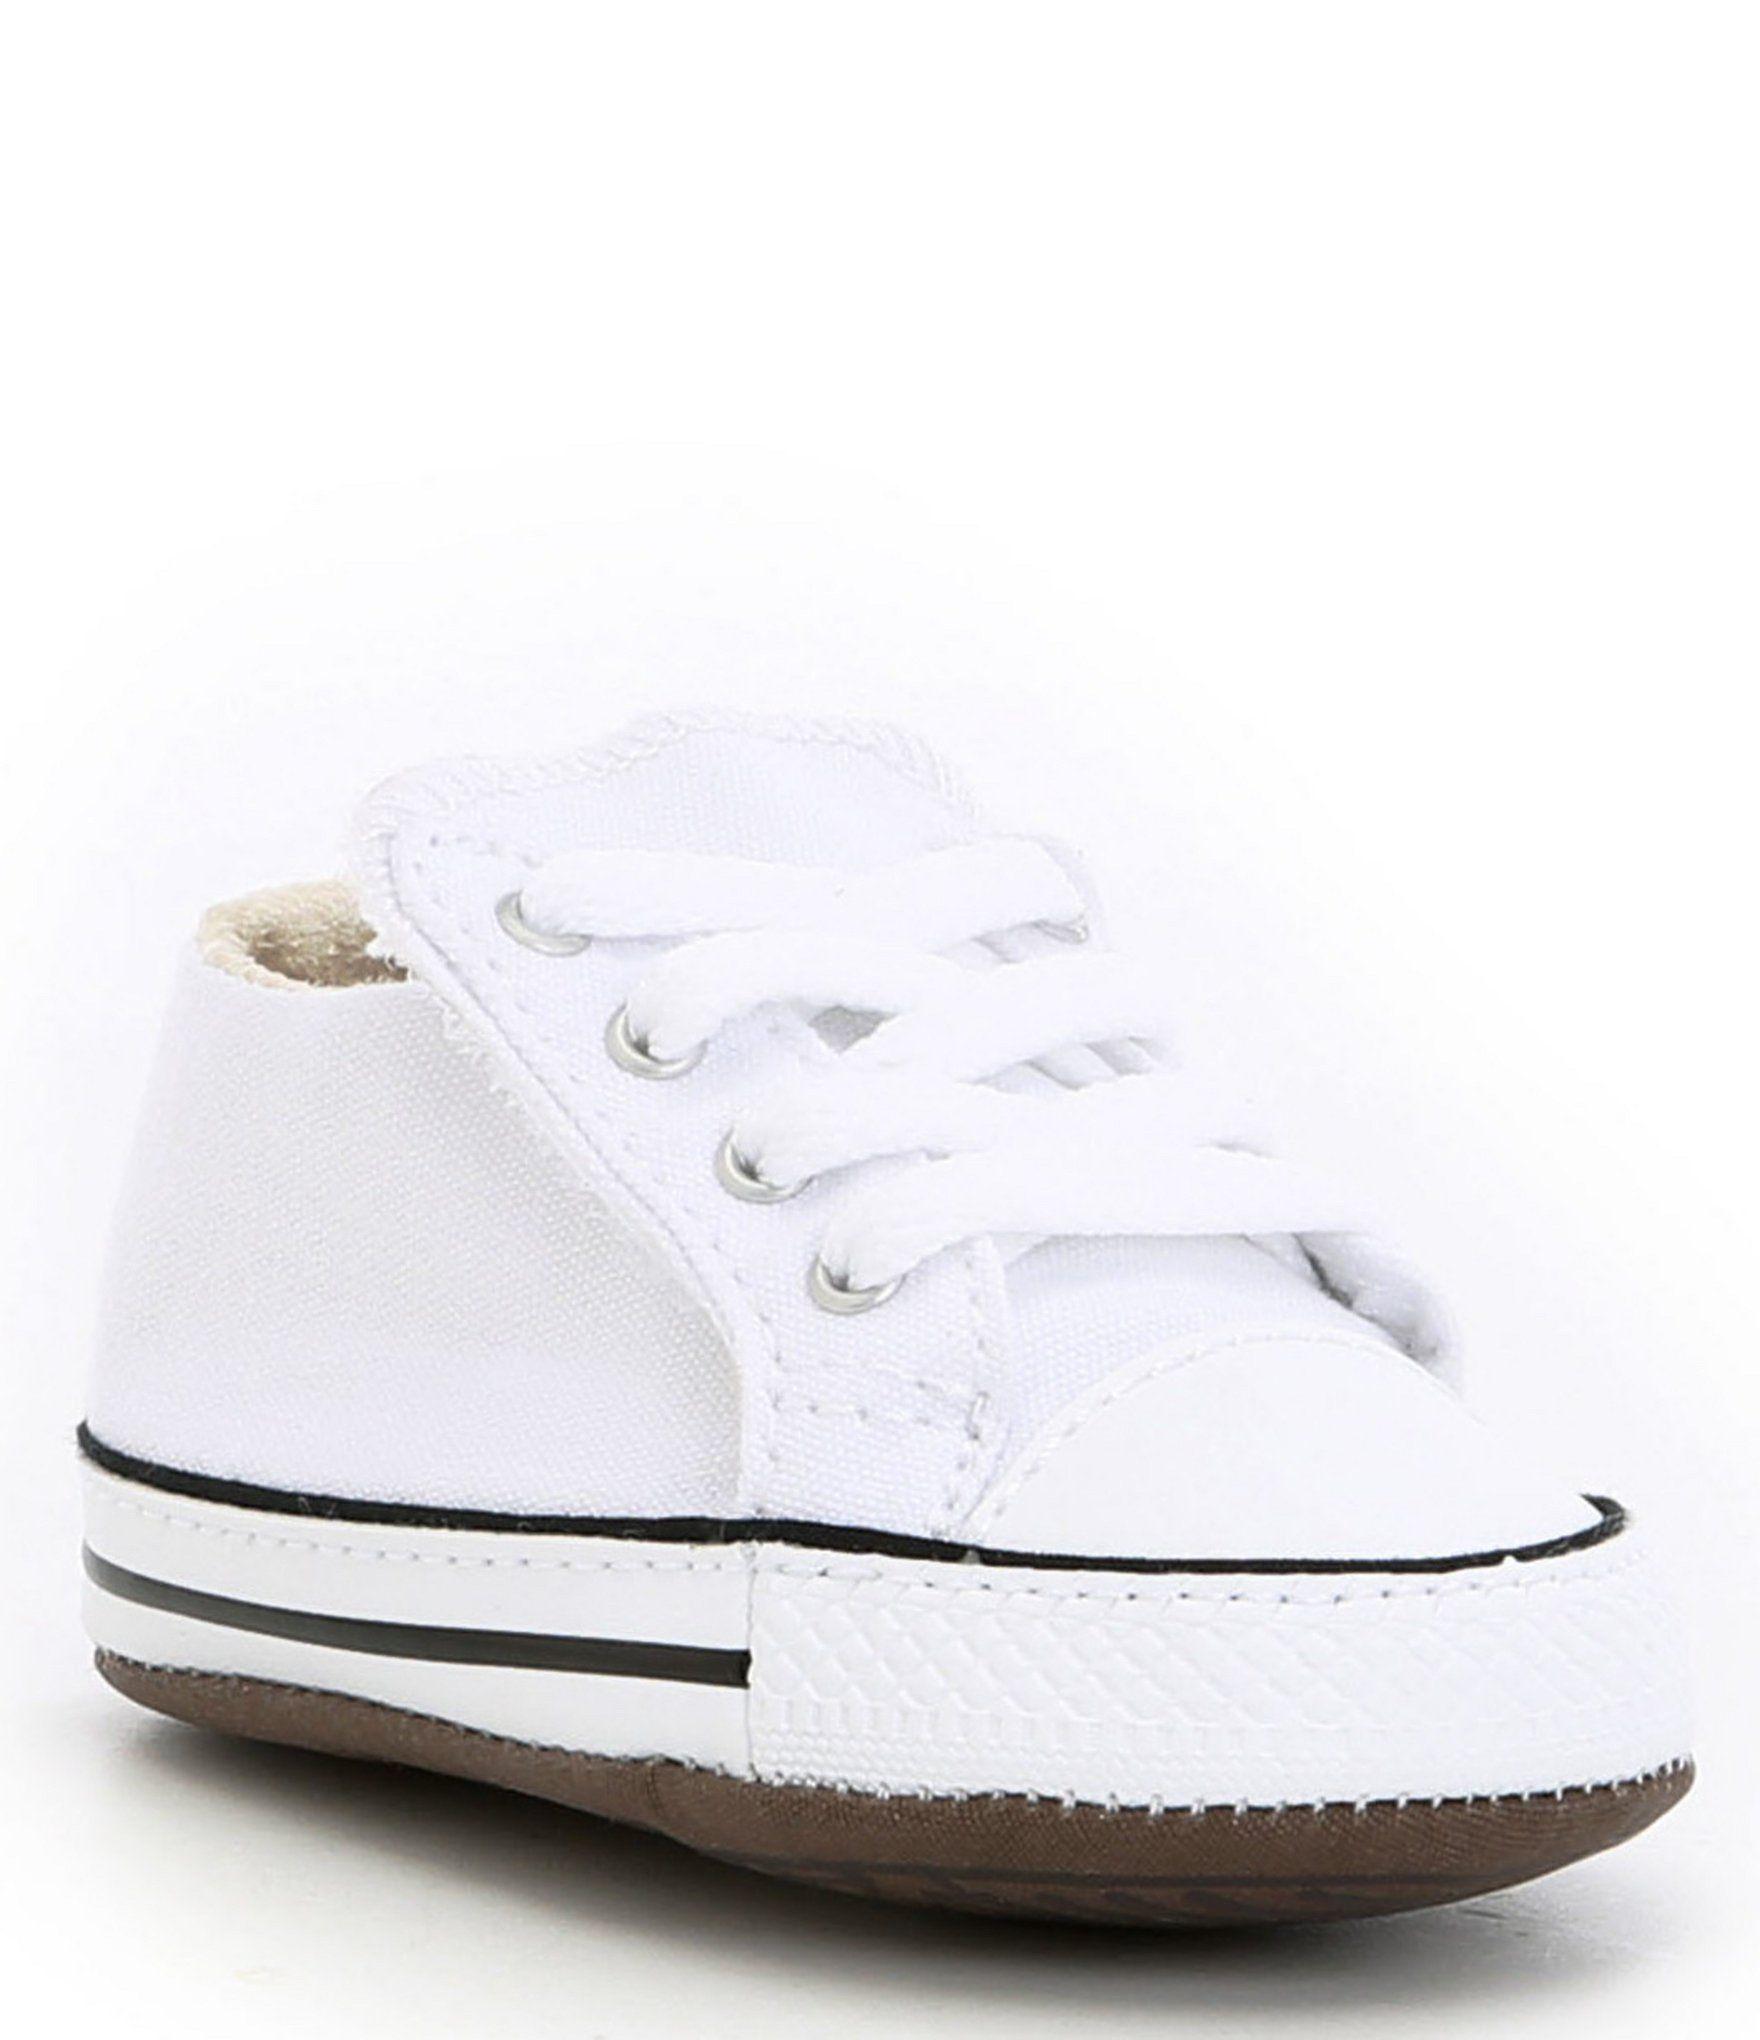 Converse Kids' Chuck Taylor All Star Cribster Crib Shoe (Infant)   Dillard's